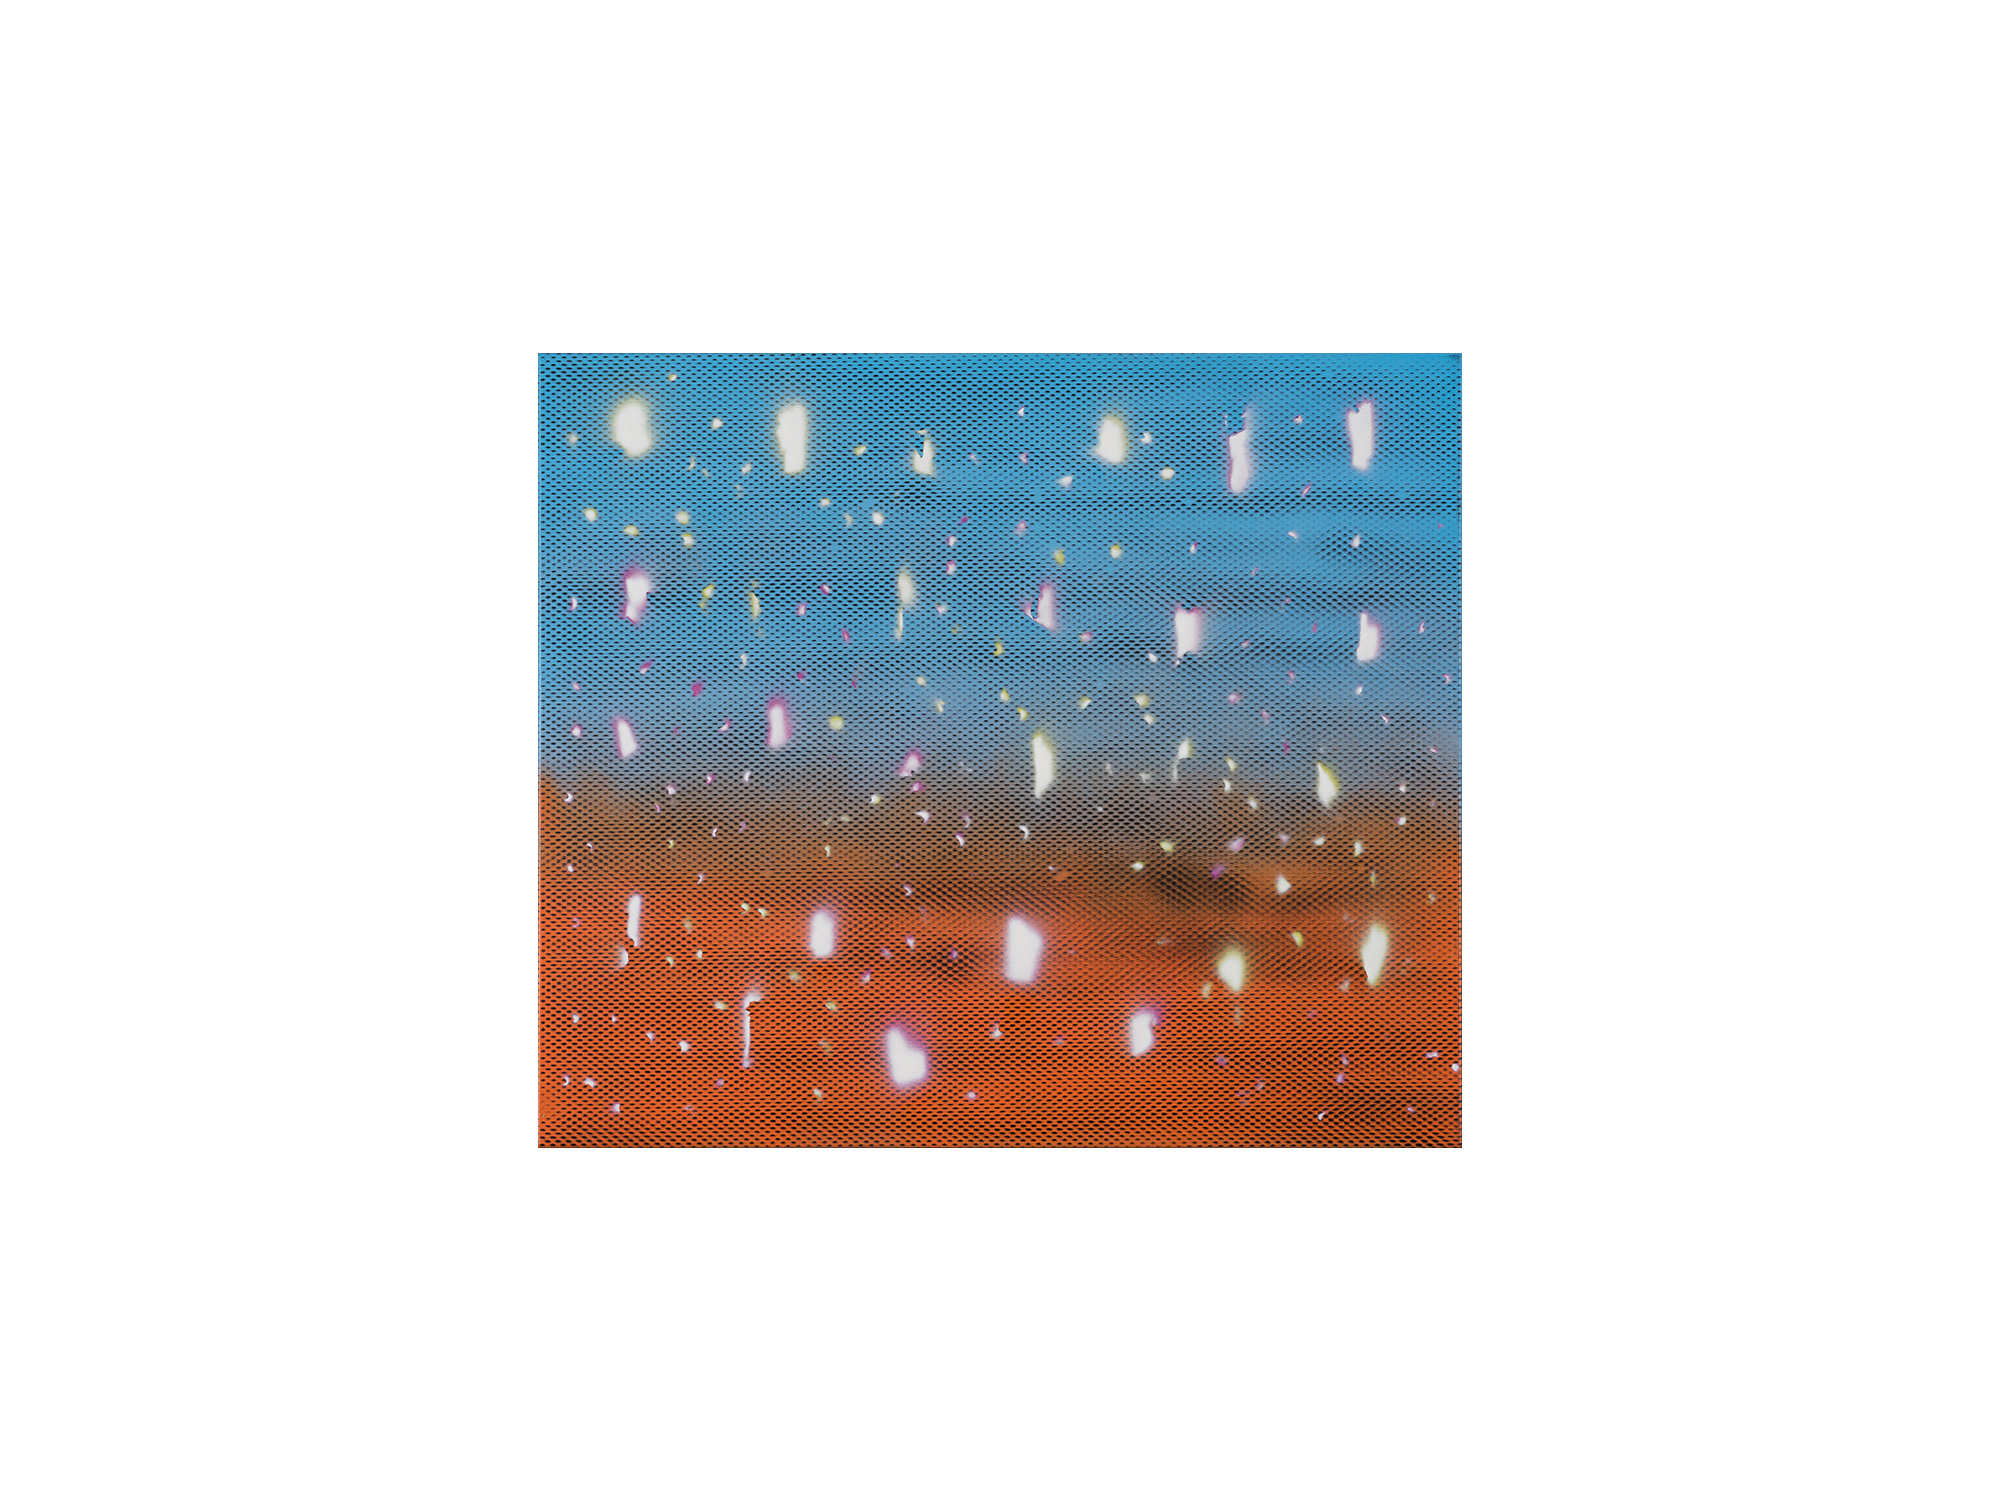 Steven Asquith   Sky Blue & Orange_Puncture Marks , 2017 spray acrylic on canvas 61 x 71cm   ARTIST BIO